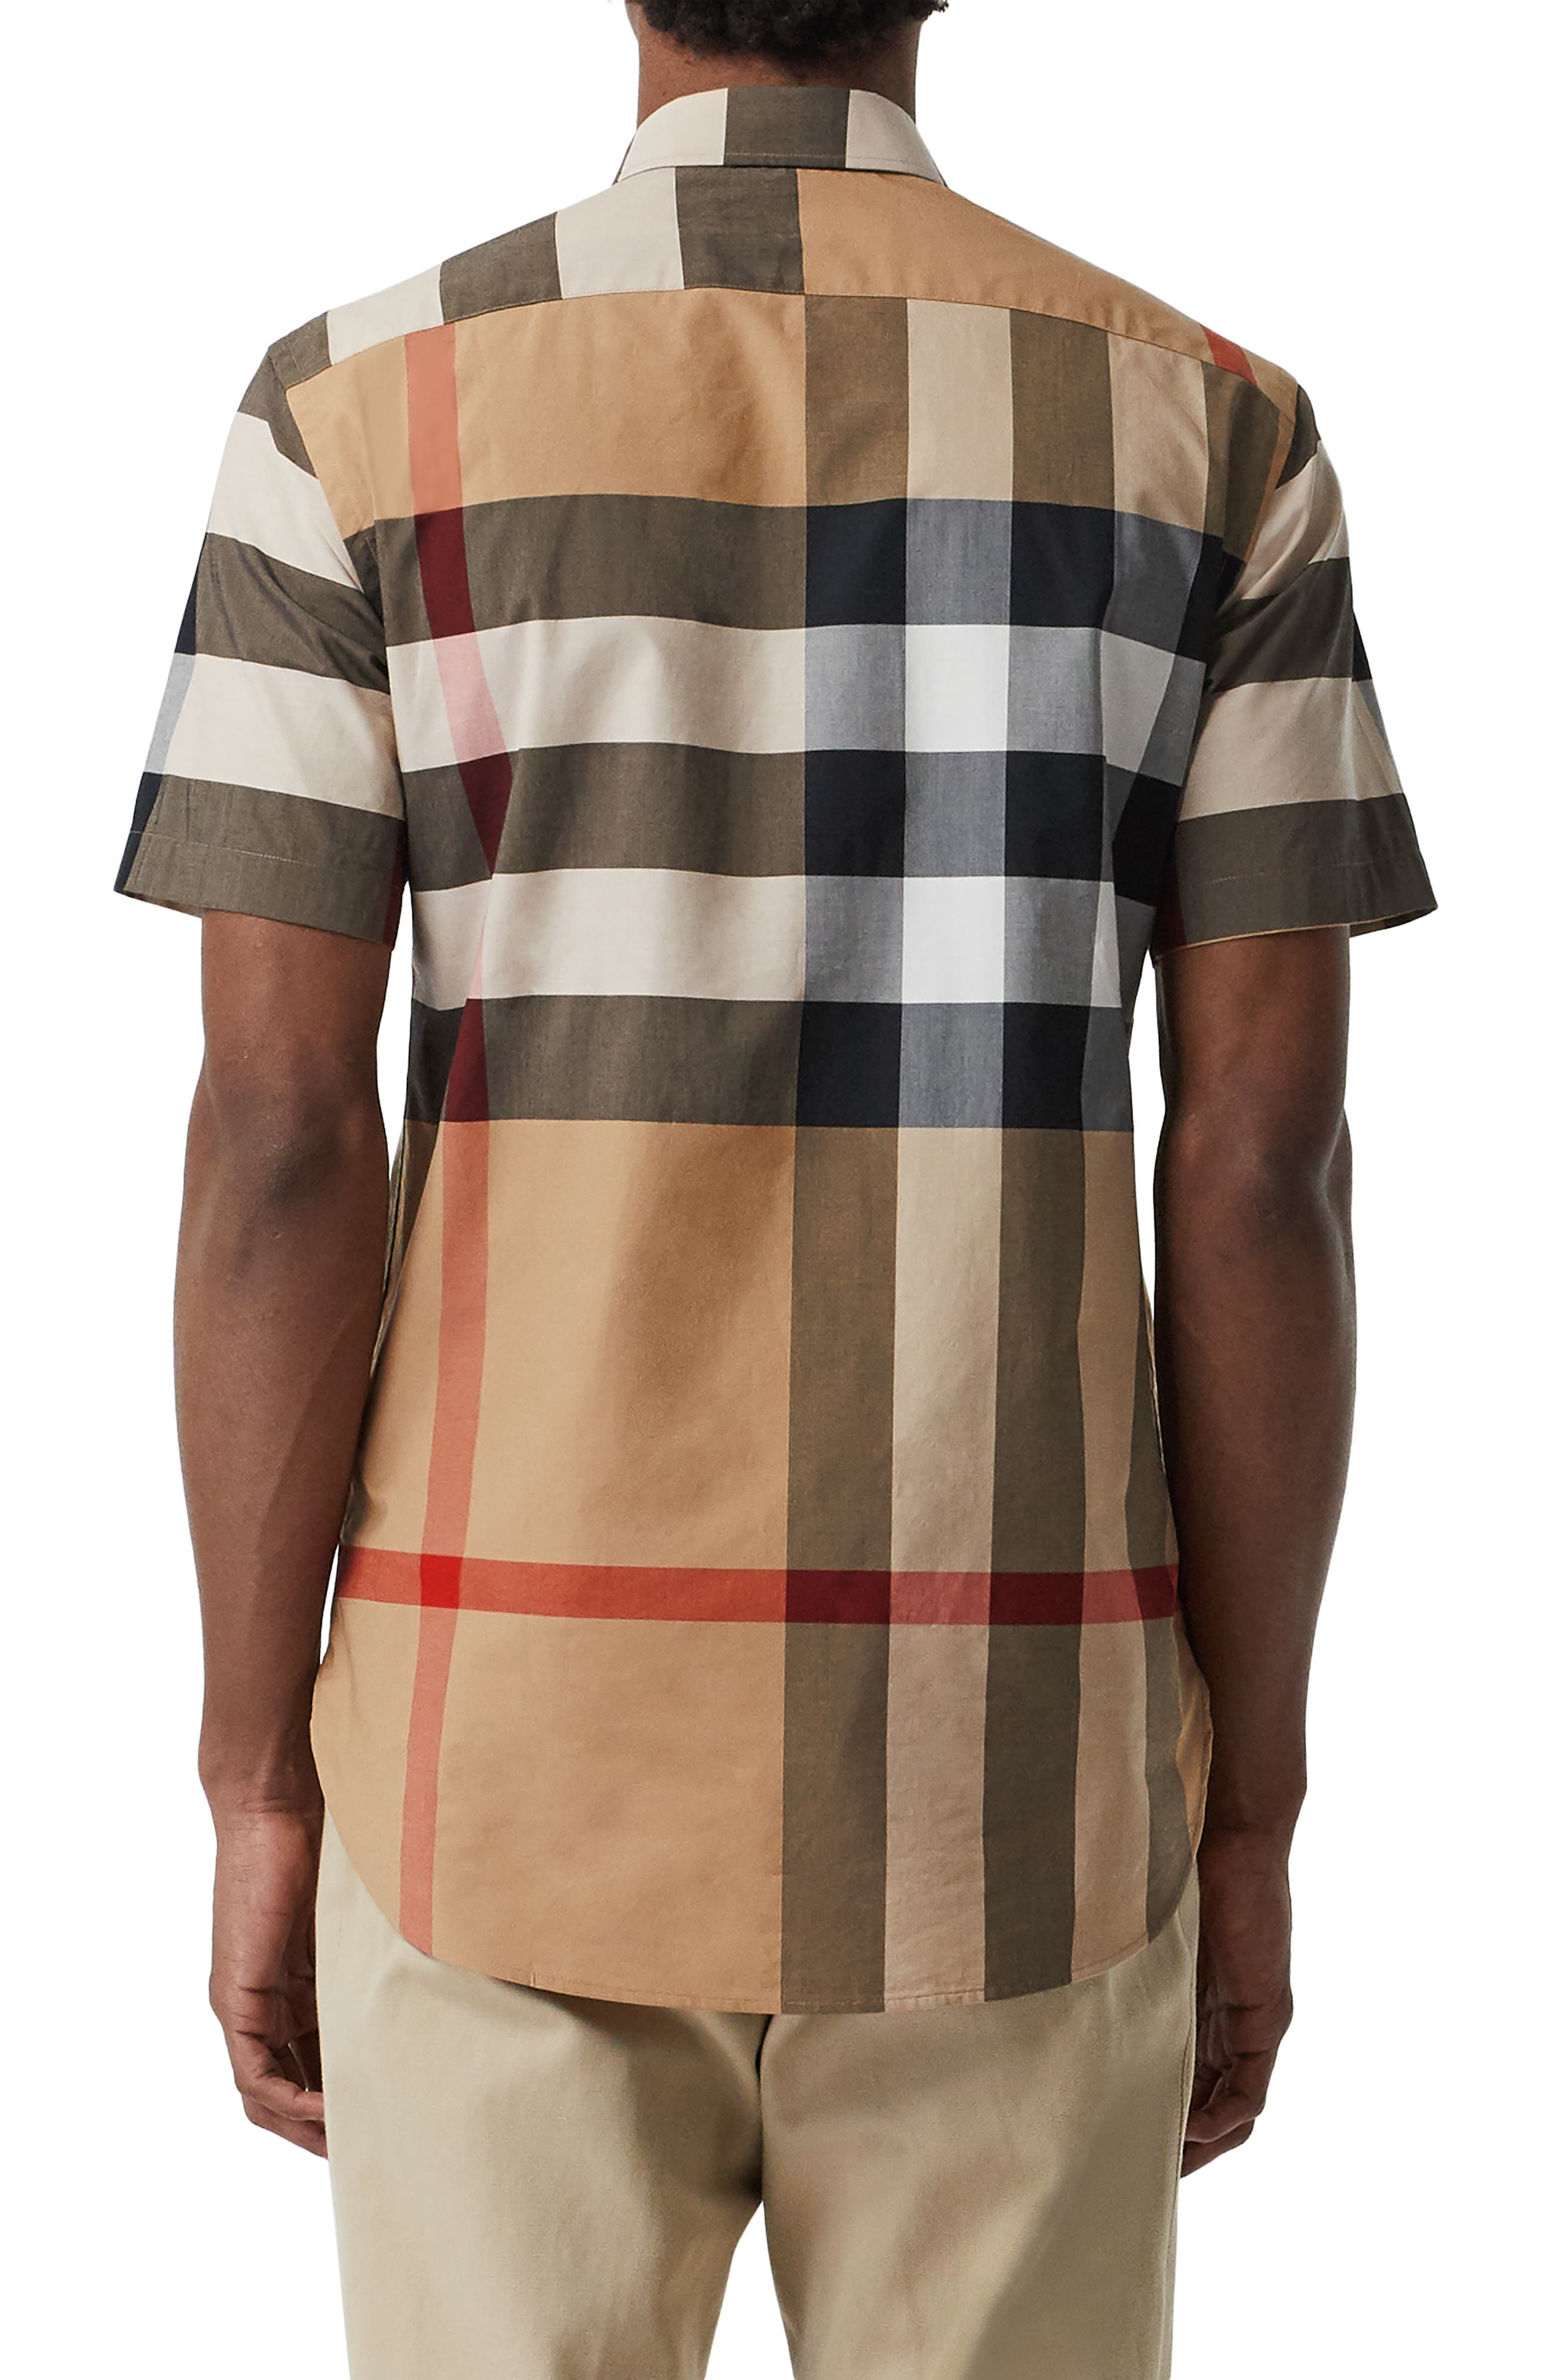 BURBERRY, Windsor Plaid Shirt, Alternate thumbnail 2, color, CAMEL